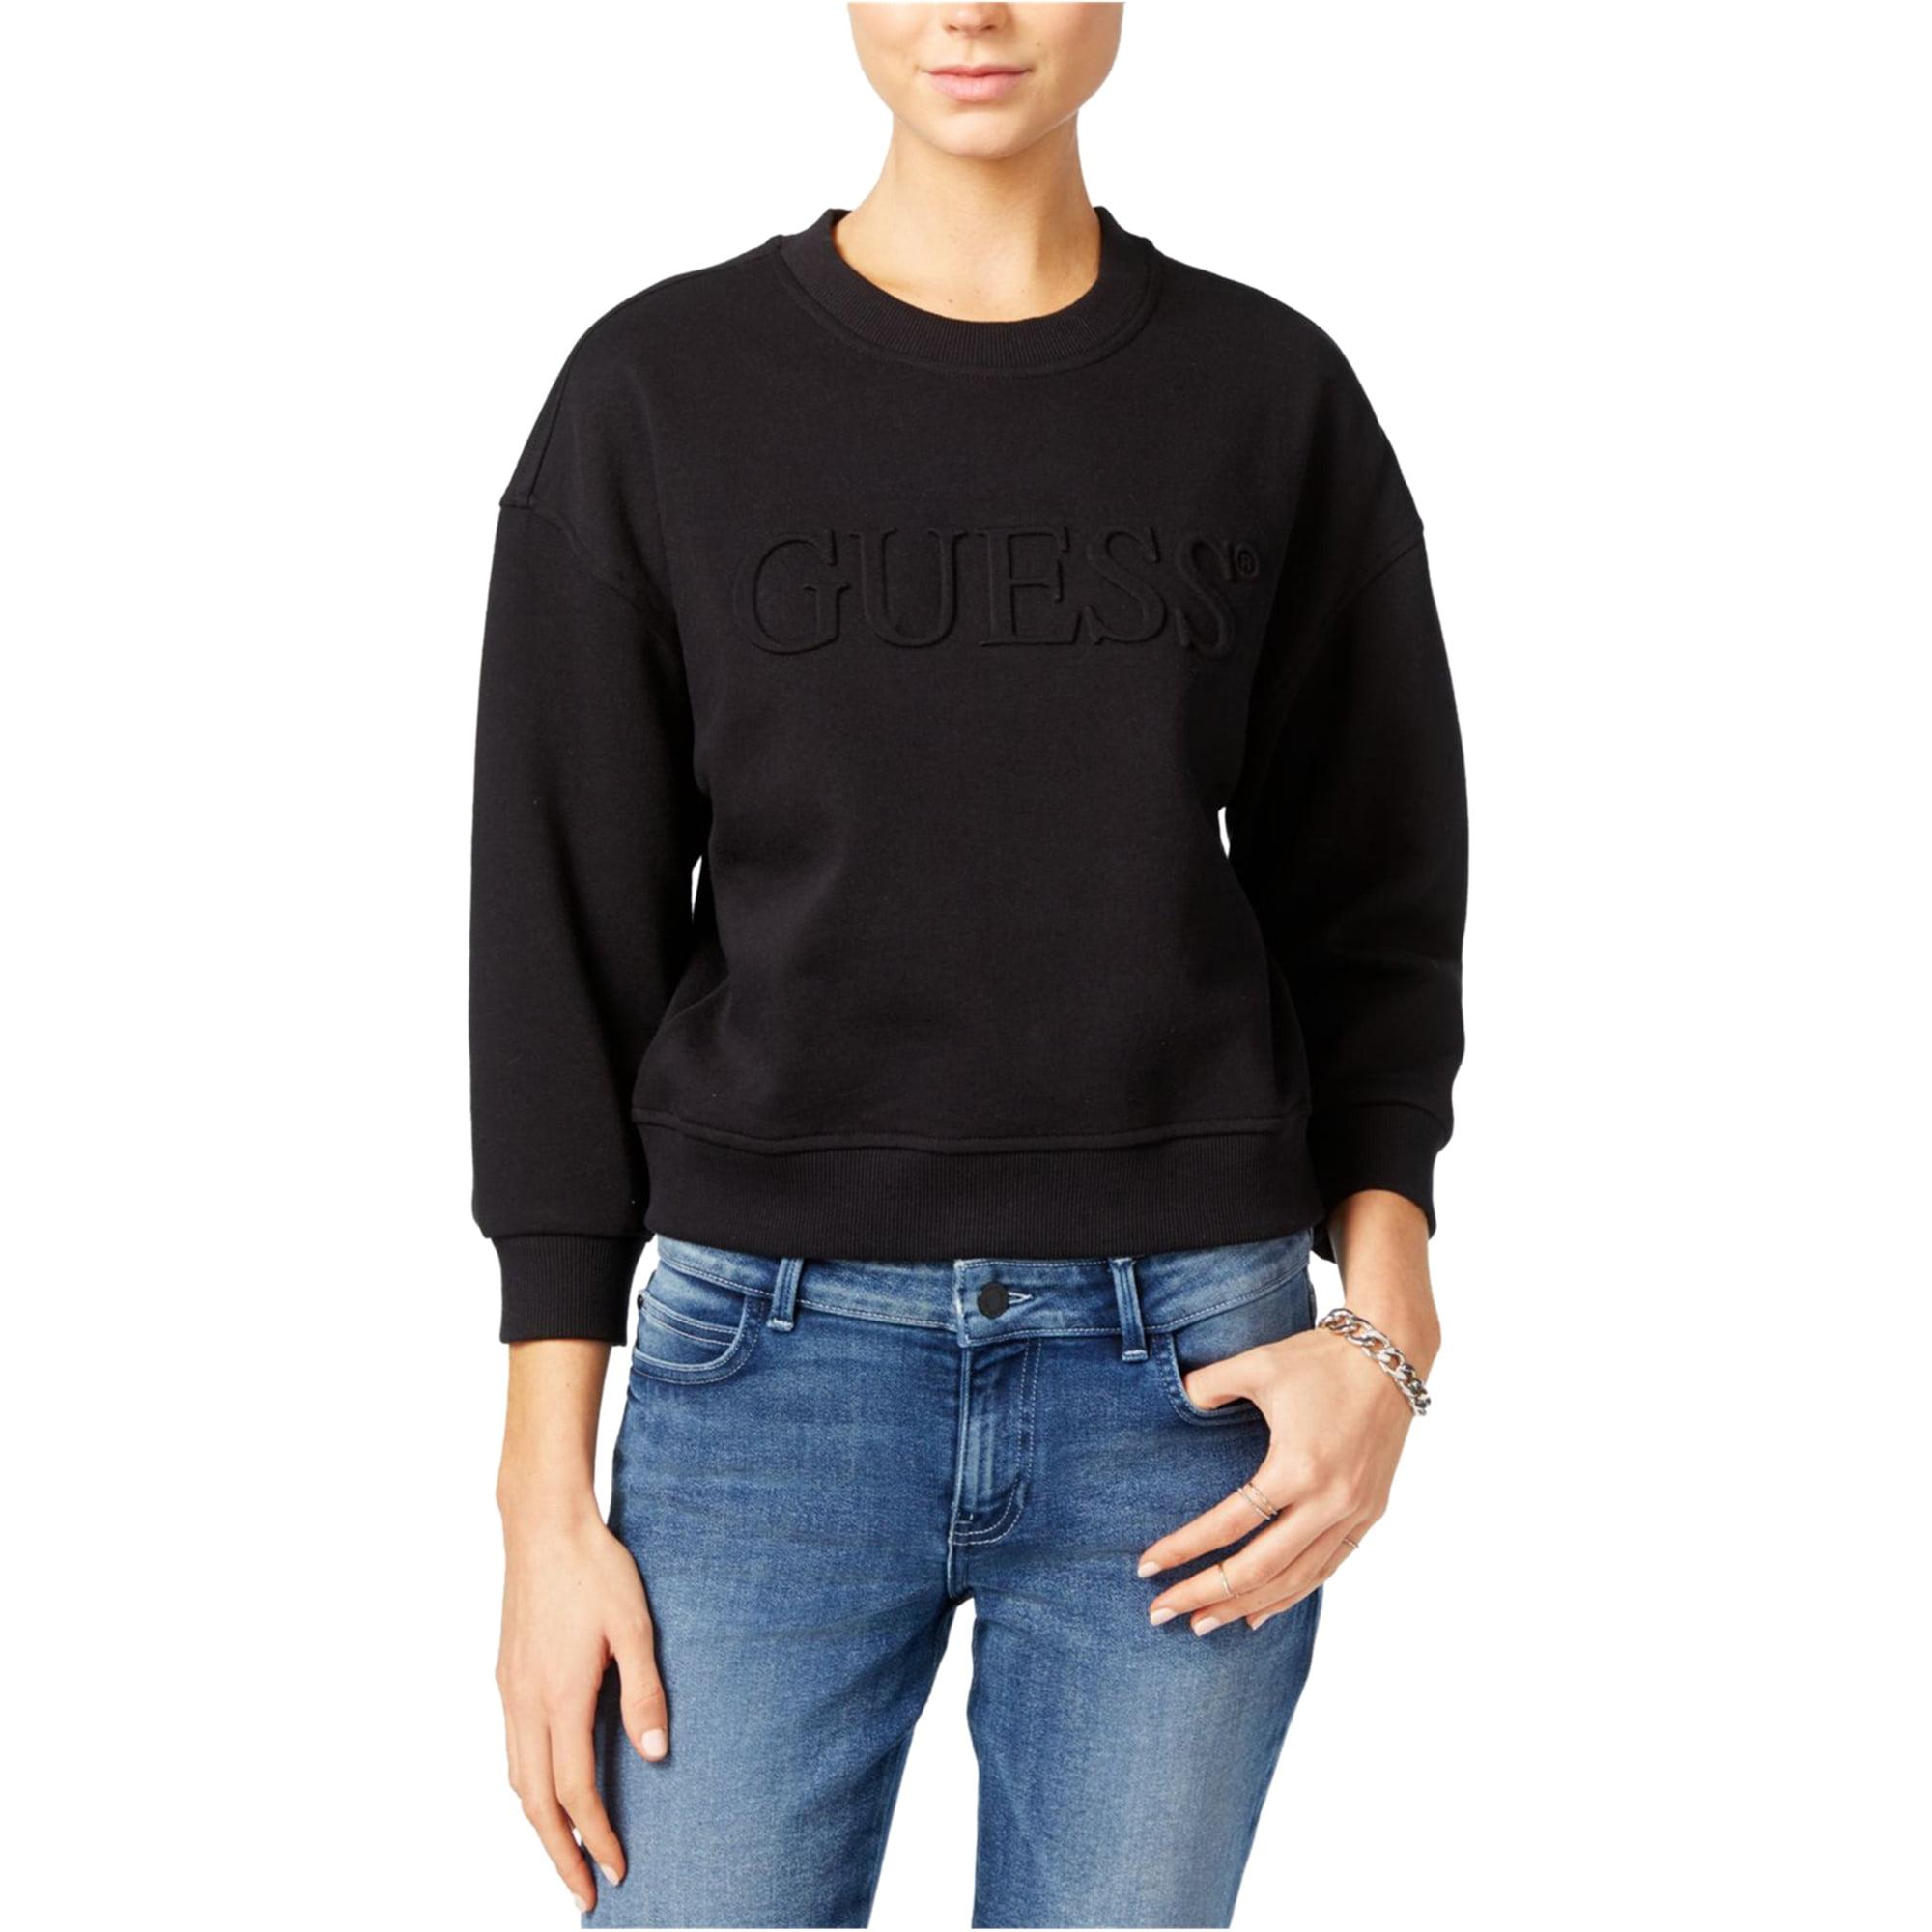 GUESS GUESS Womens Cropped Sweatshirt, Black, X Small